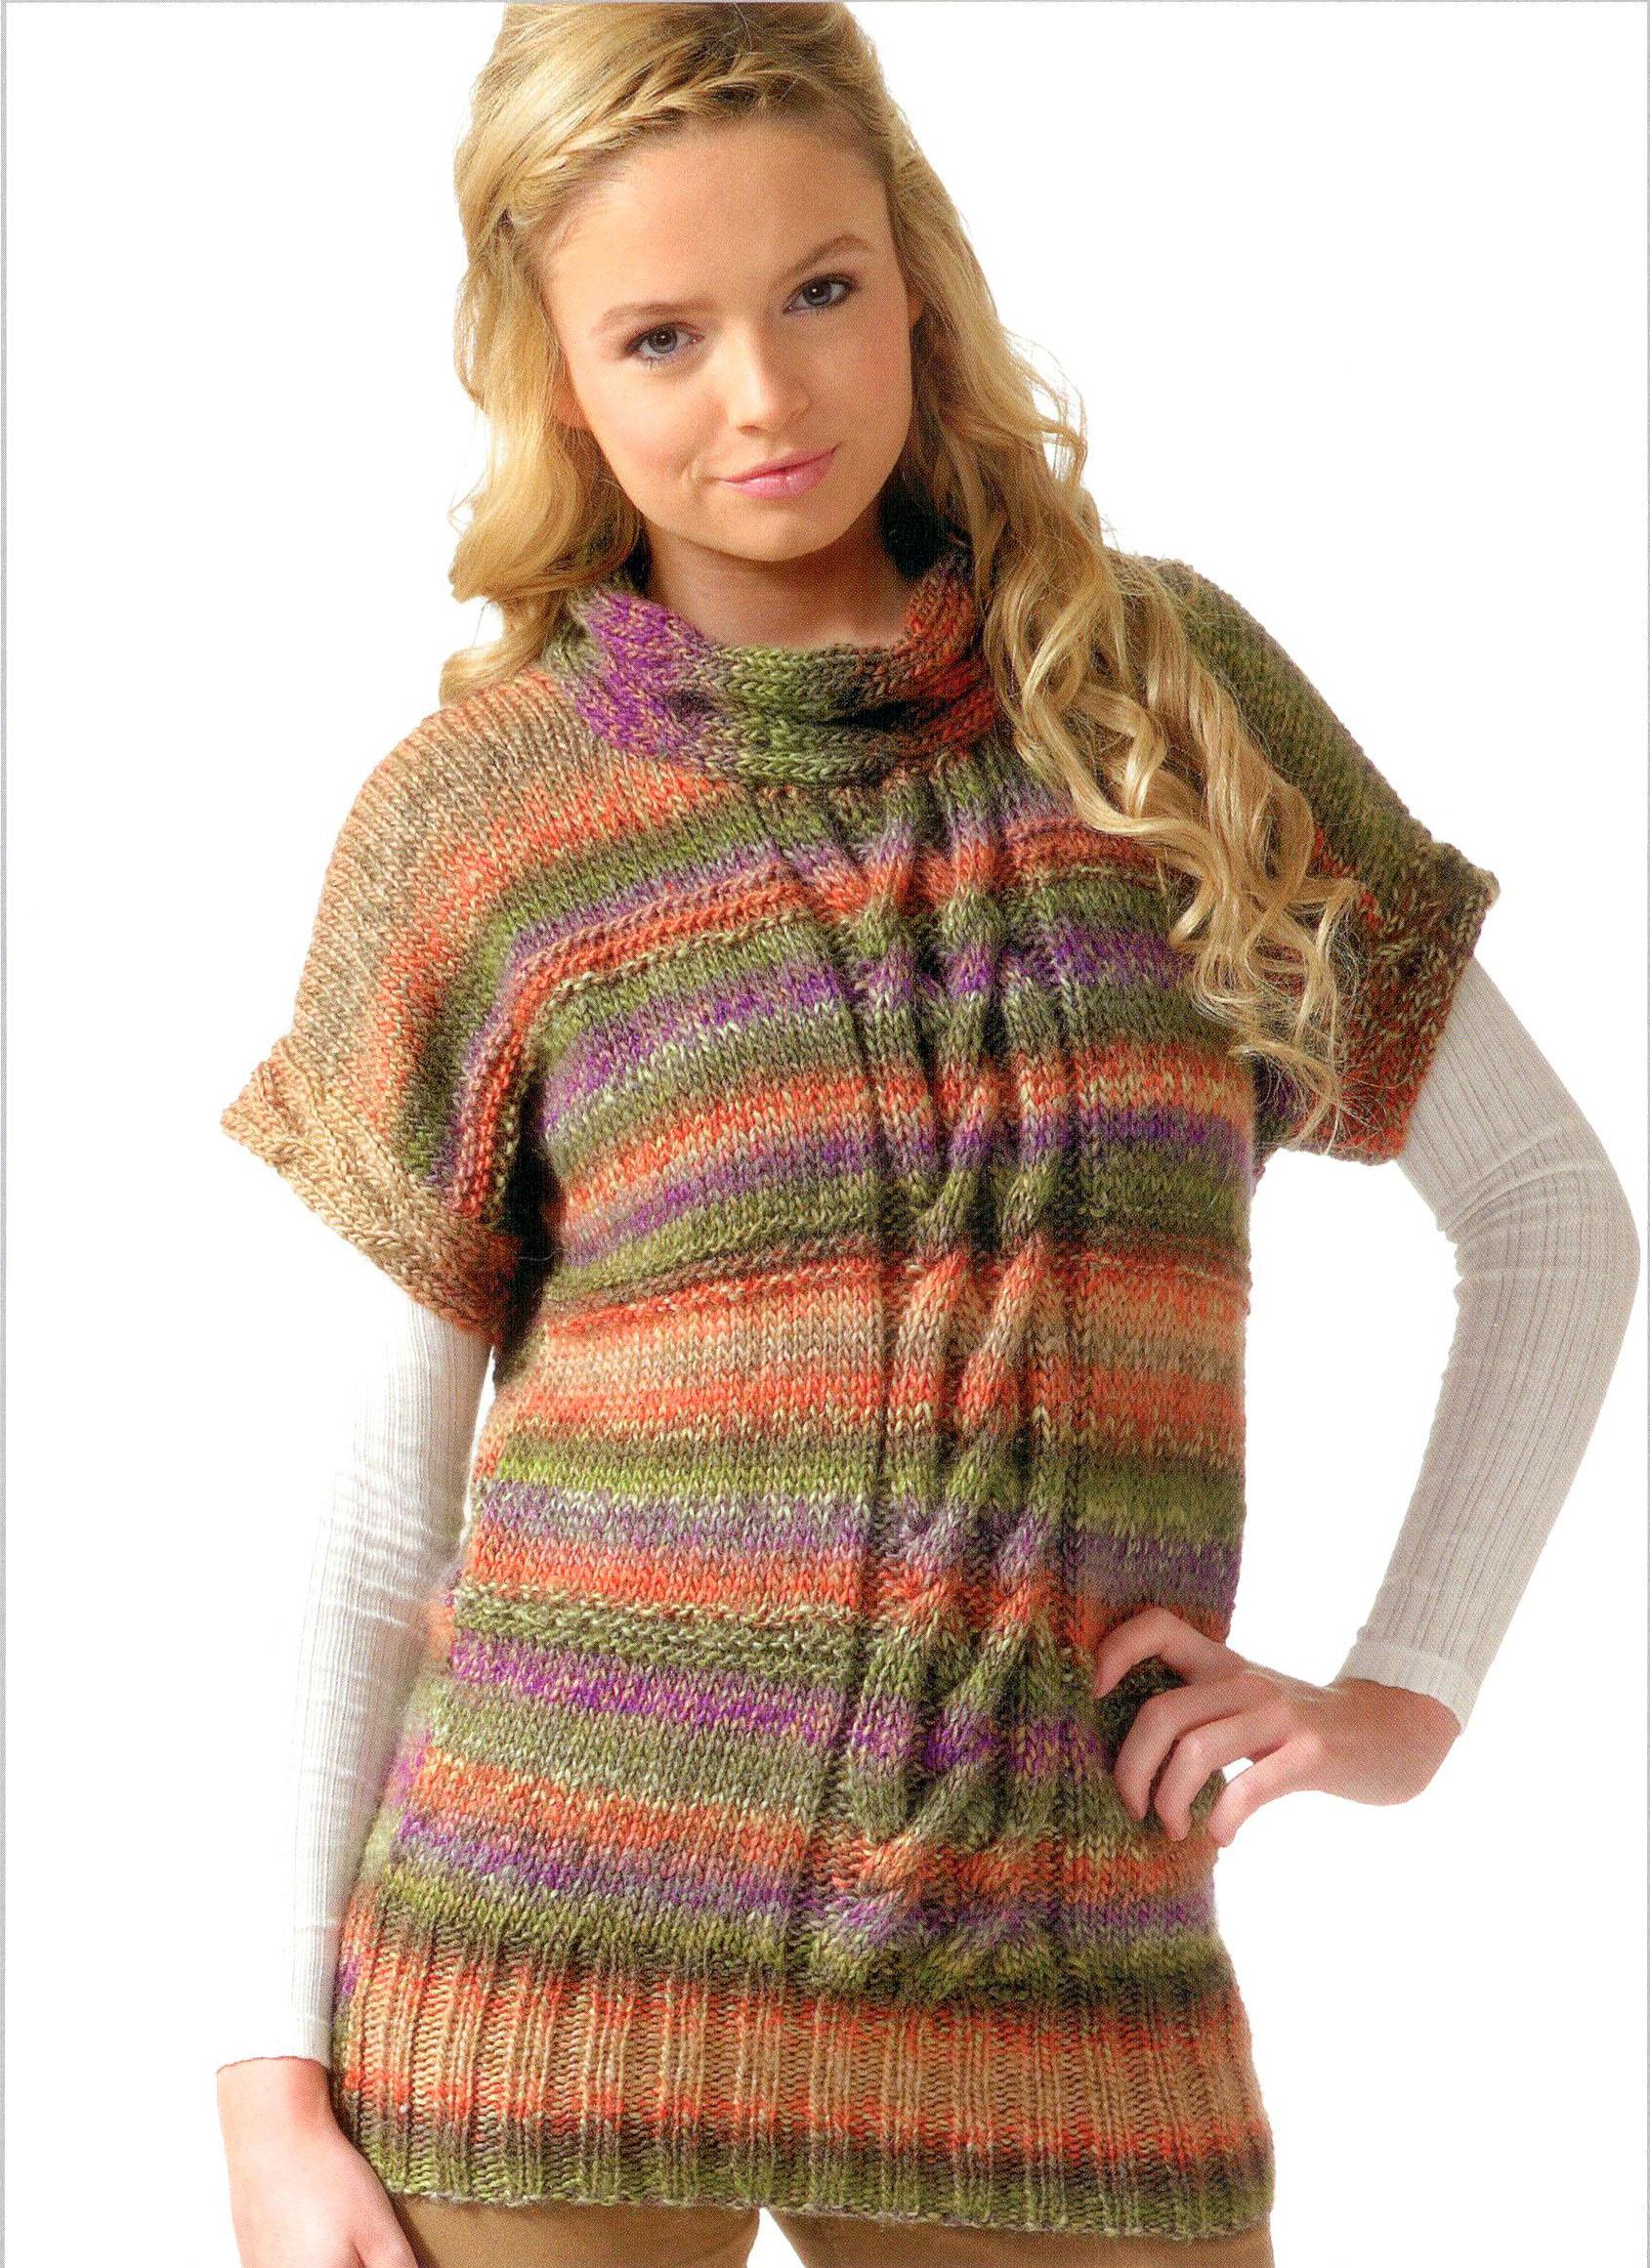 Ladies Short Sleeve Tunic Top JB091 Knitting Pattern - Athenbys